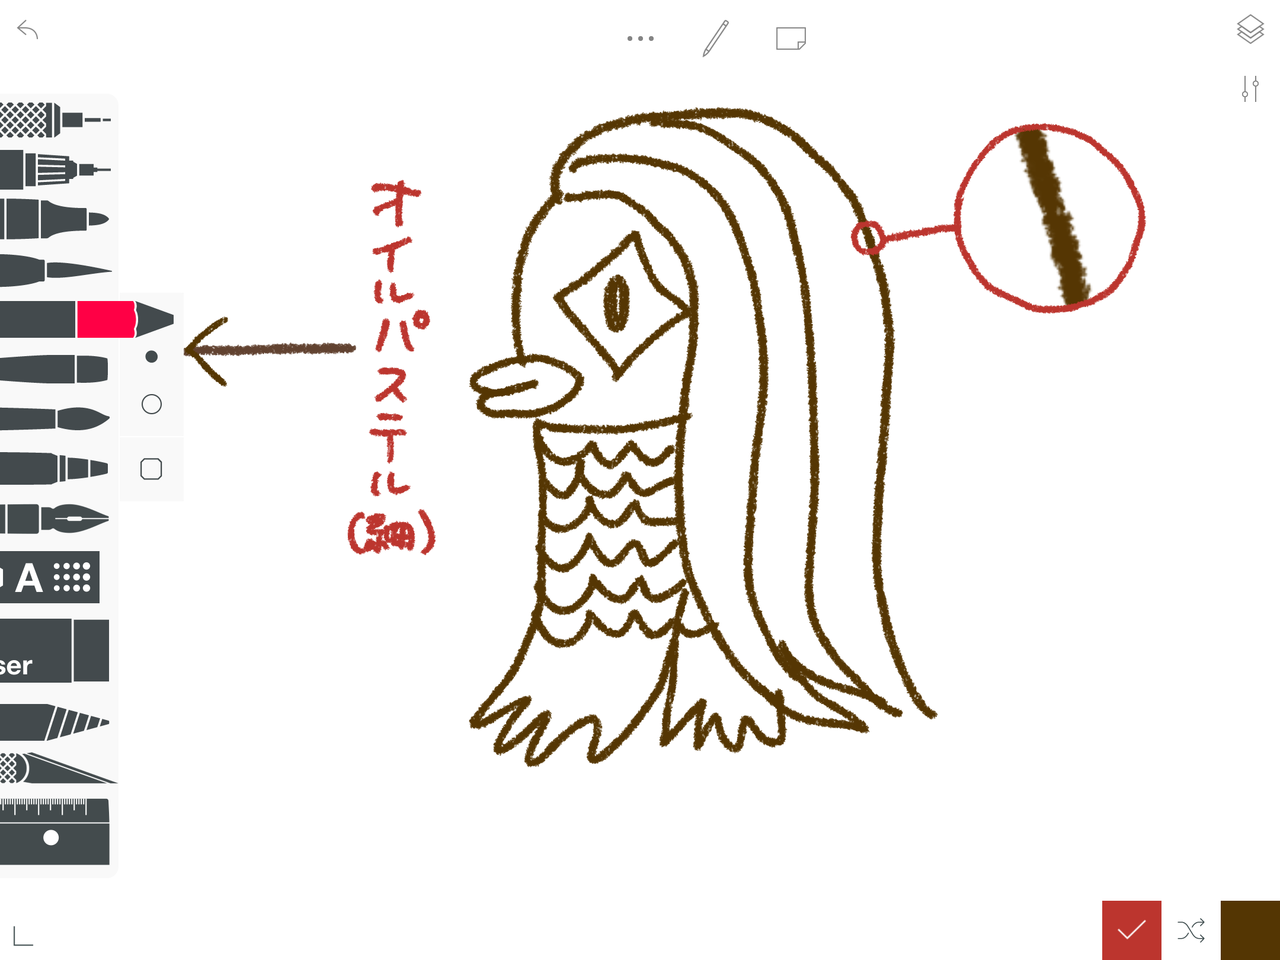 f:id:Imamura:20200421201929p:plain